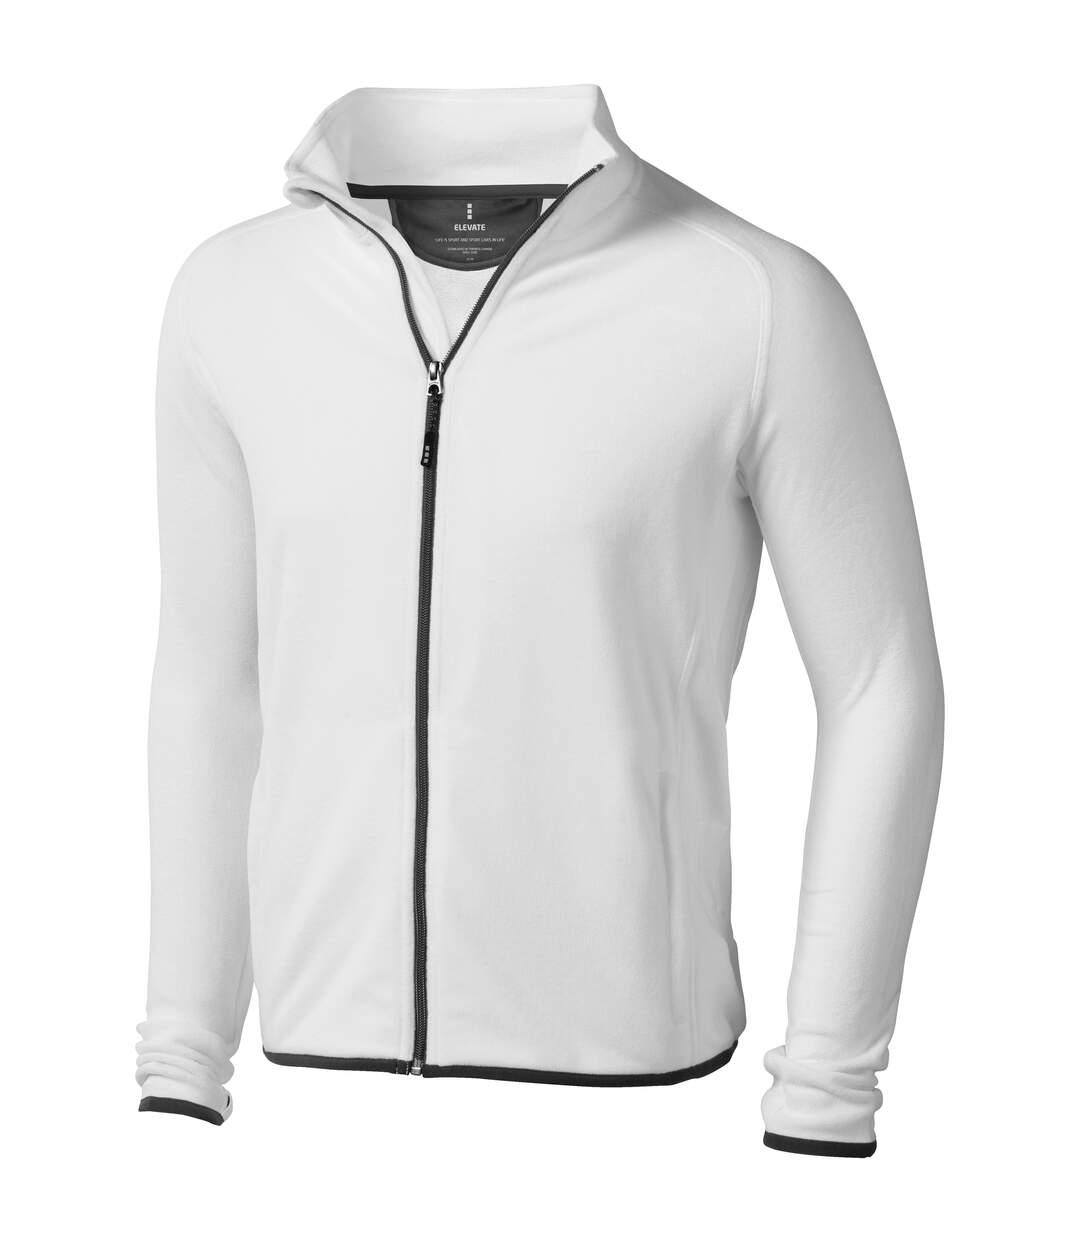 Elevate Mens Brossard Micro Fleece (White) - UTPF1944